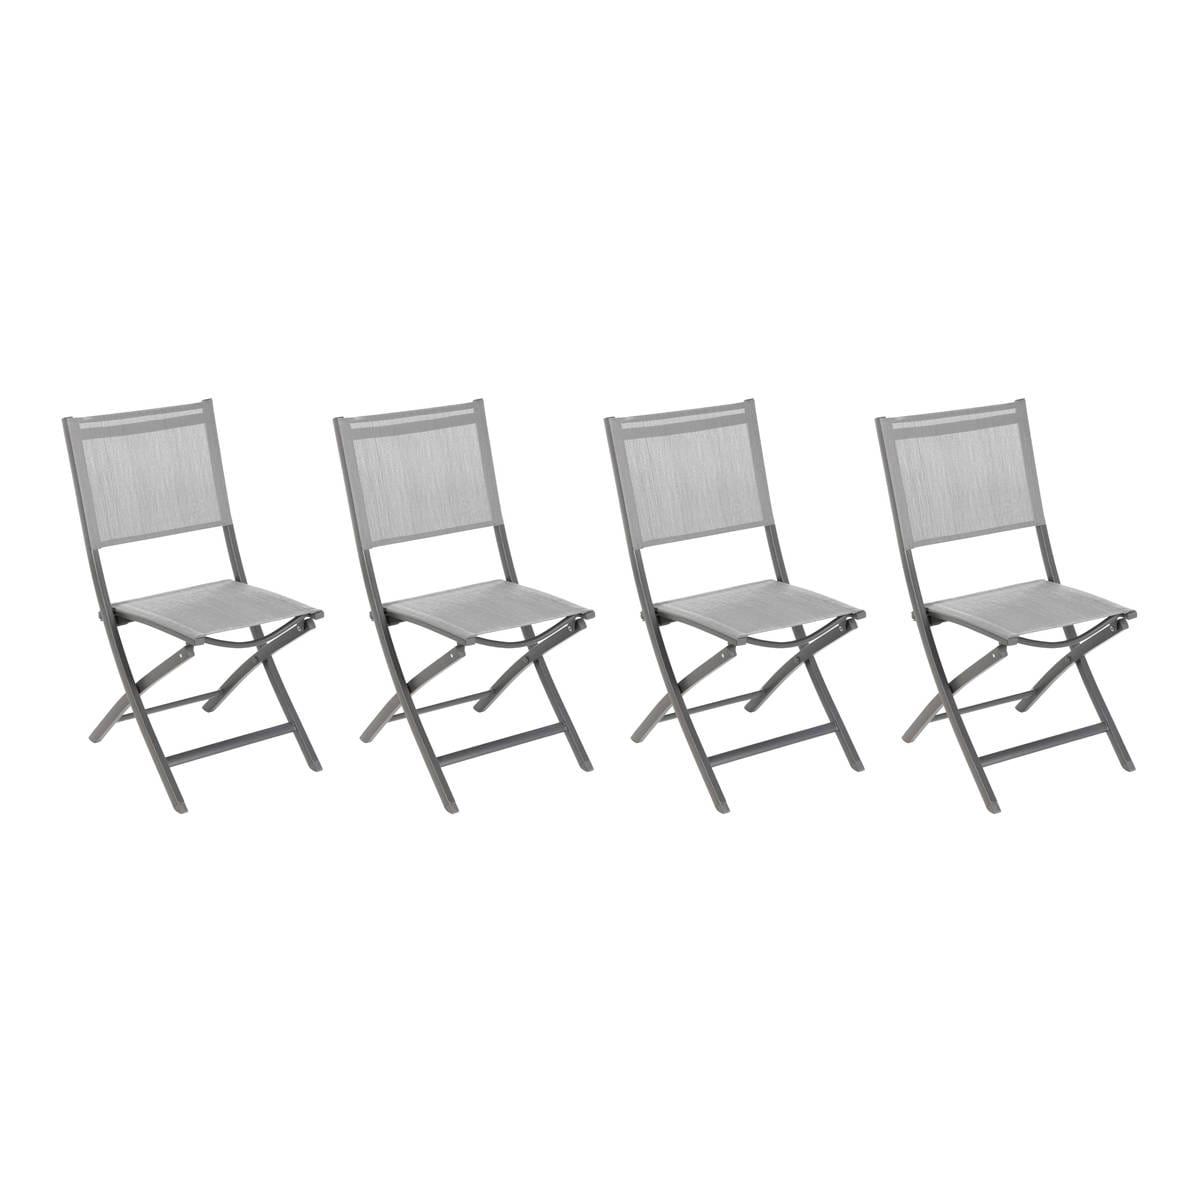 Lot de 4 chaises de jardin pliantes Essentia Galet & Gris , Hesperide.com